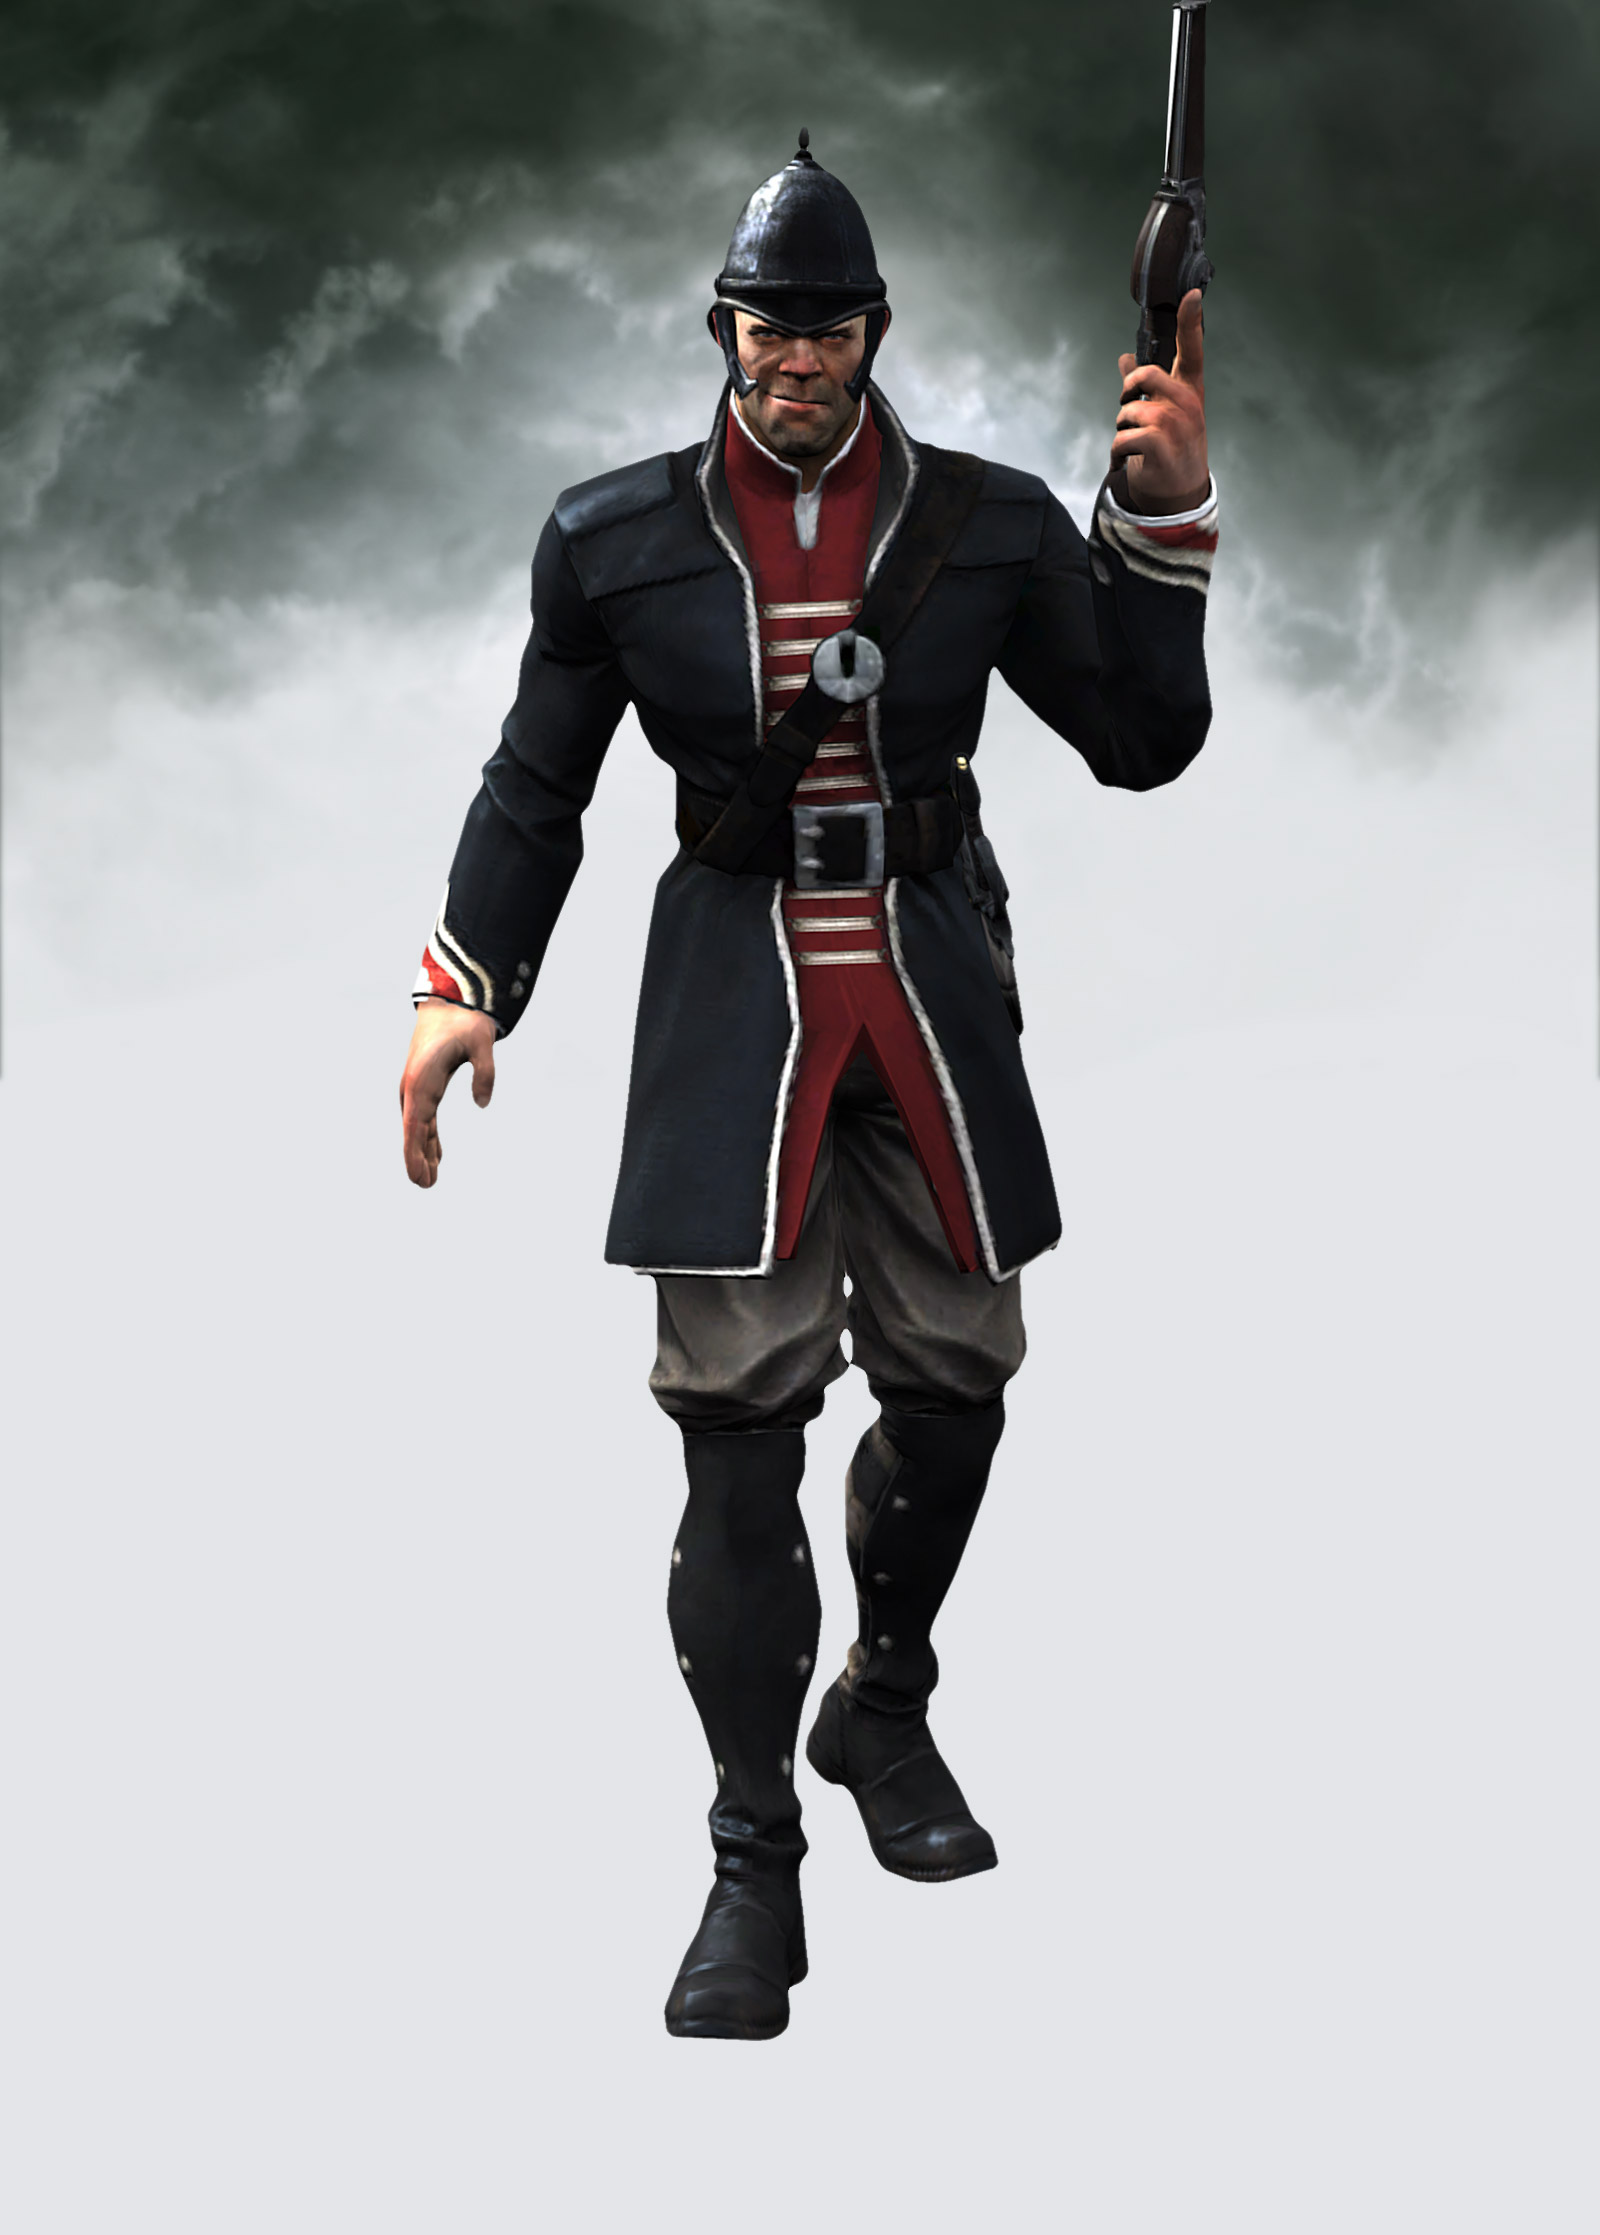 Image - Elite Guard.jpg | Dishonored Wiki | Fandom powered ...